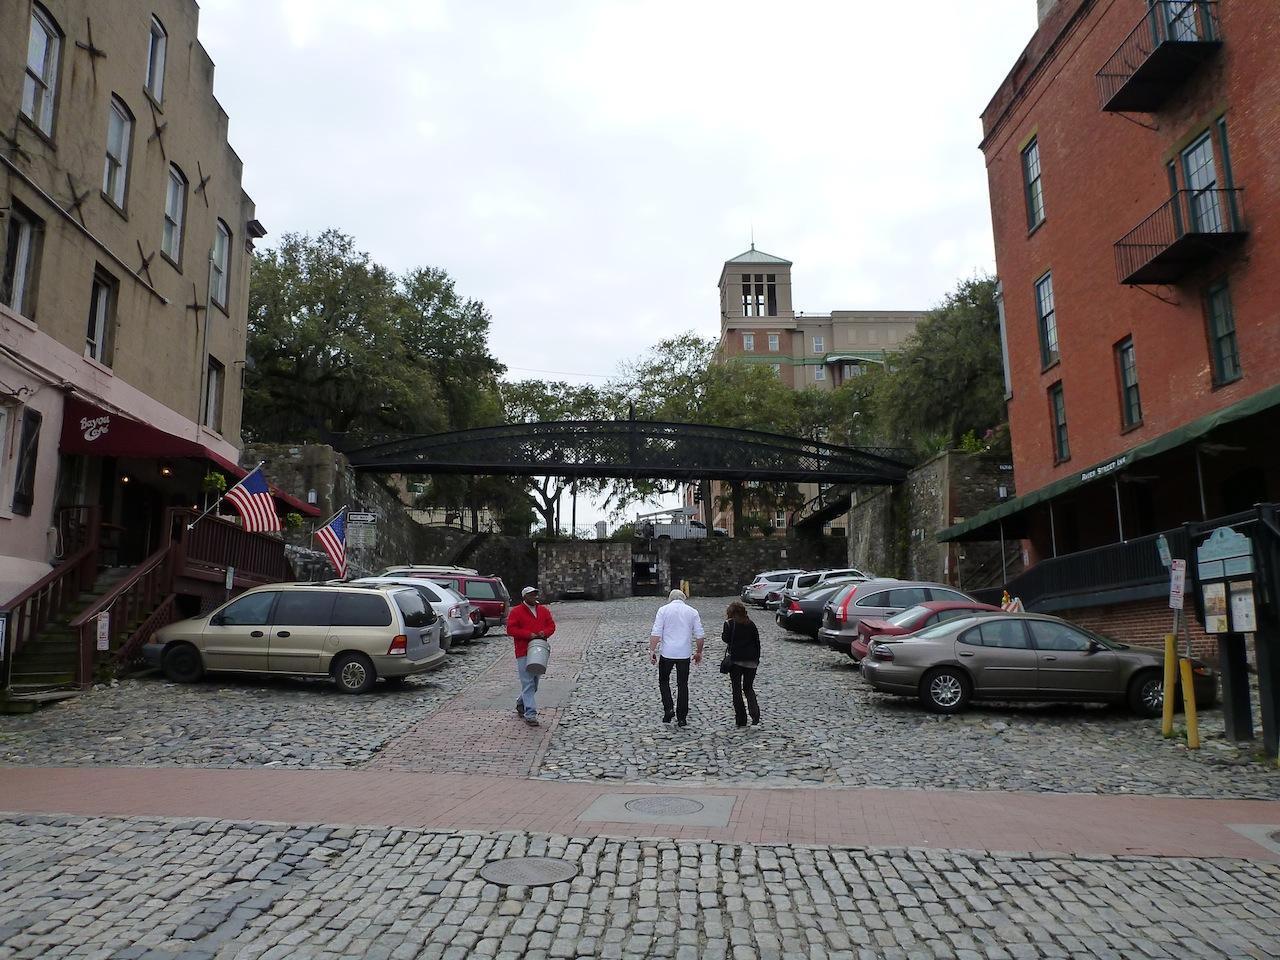 A Pedestrian Bridge Over The Cobblestone Street